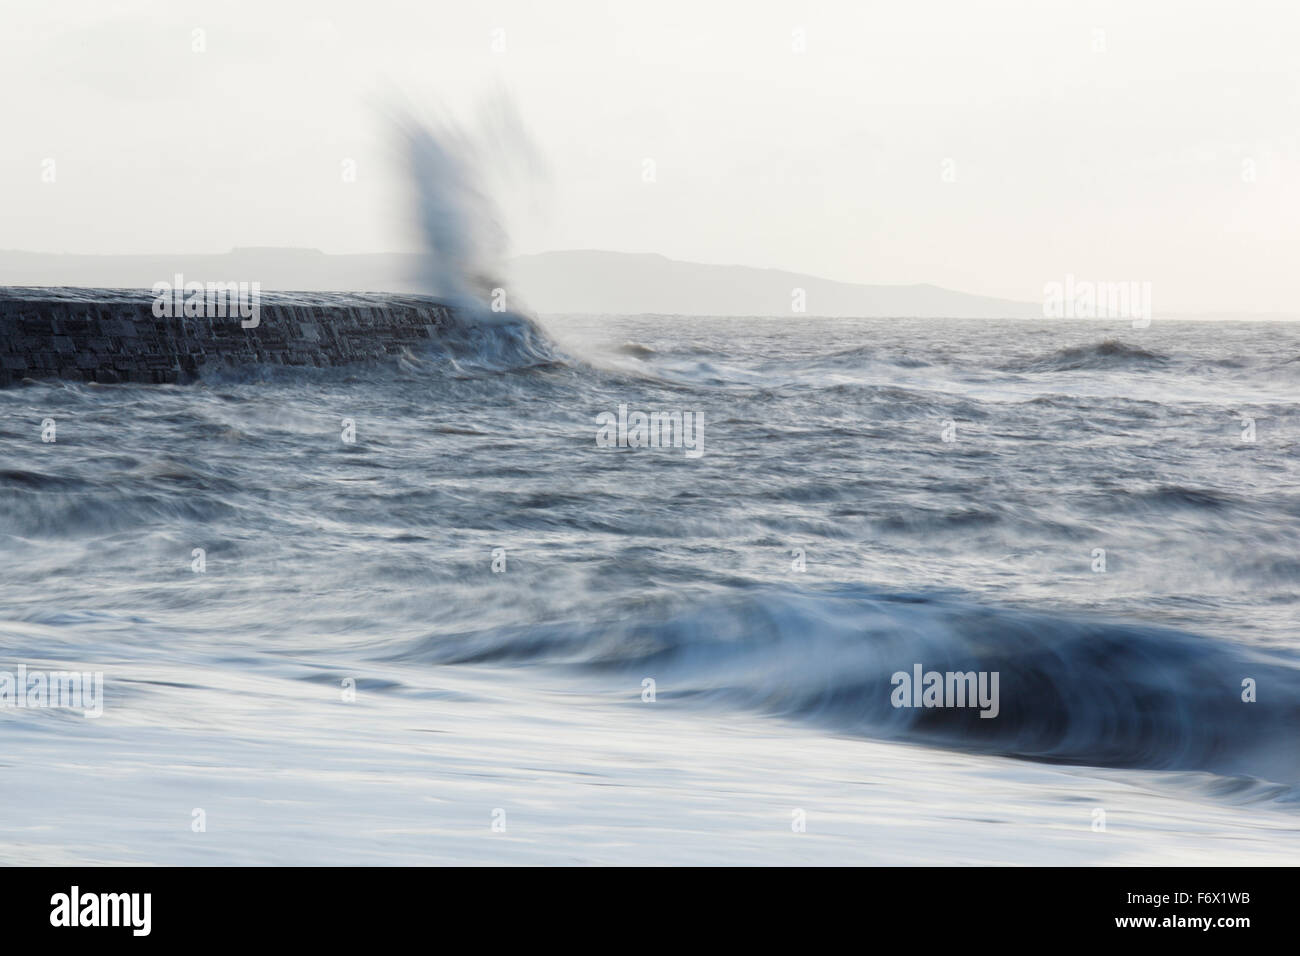 Rough seas crashing against The Cobb harbour wall. Lyme Regis. Dorset. UK. - Stock Image